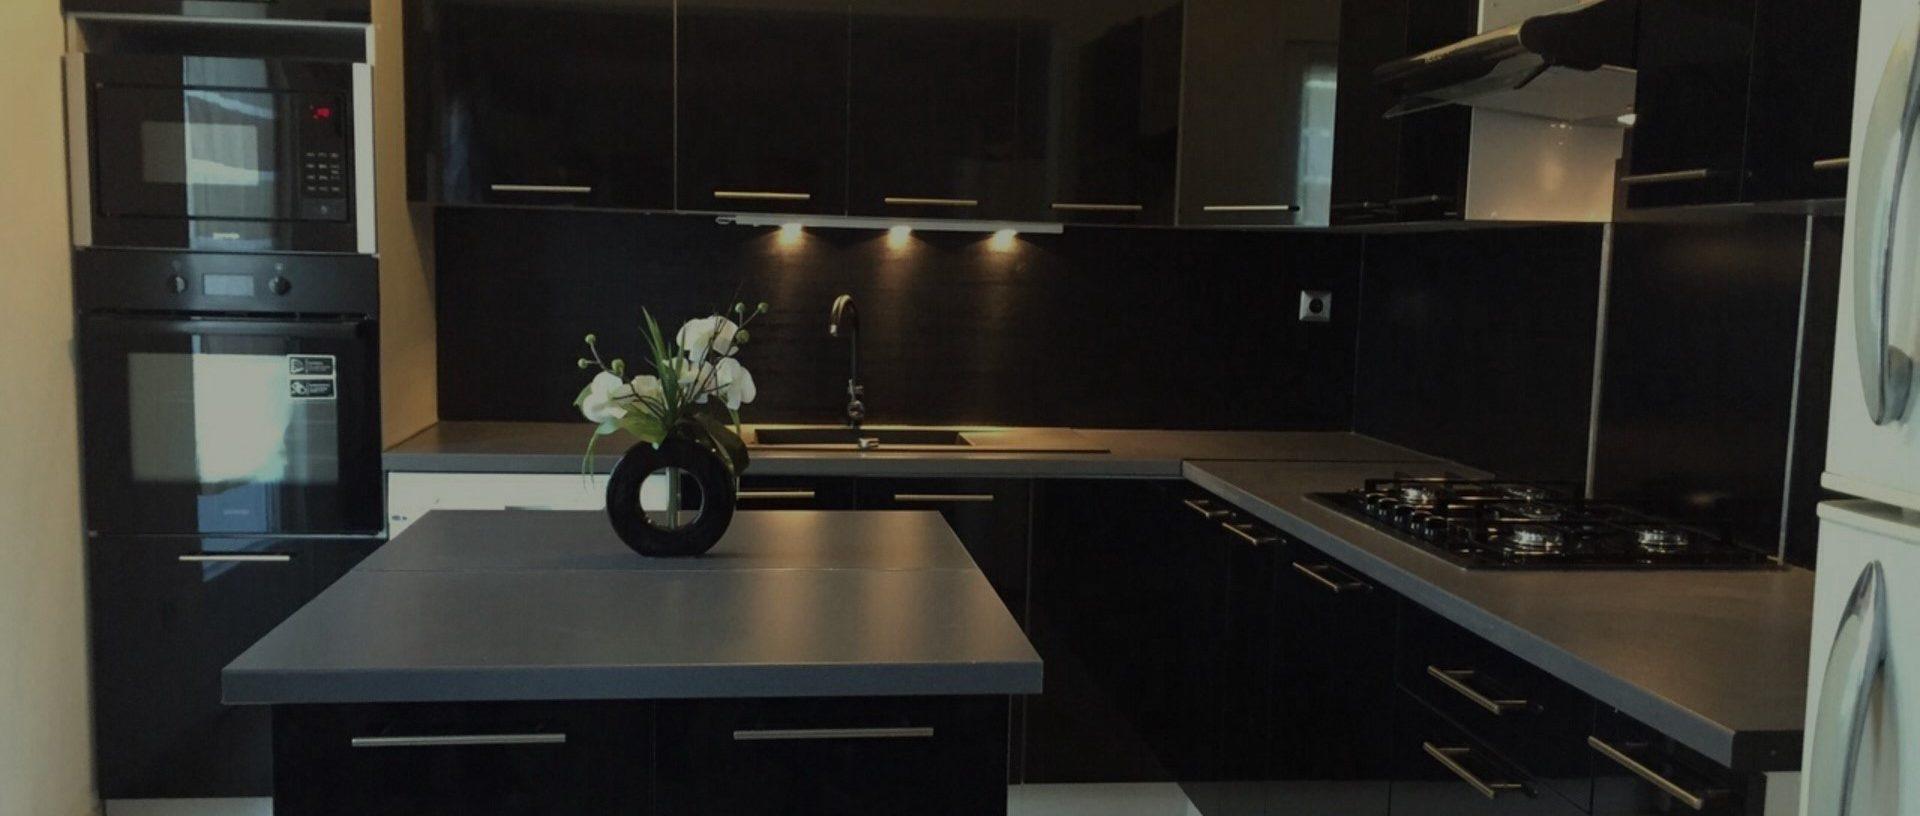 cuisine house expert en cuisines